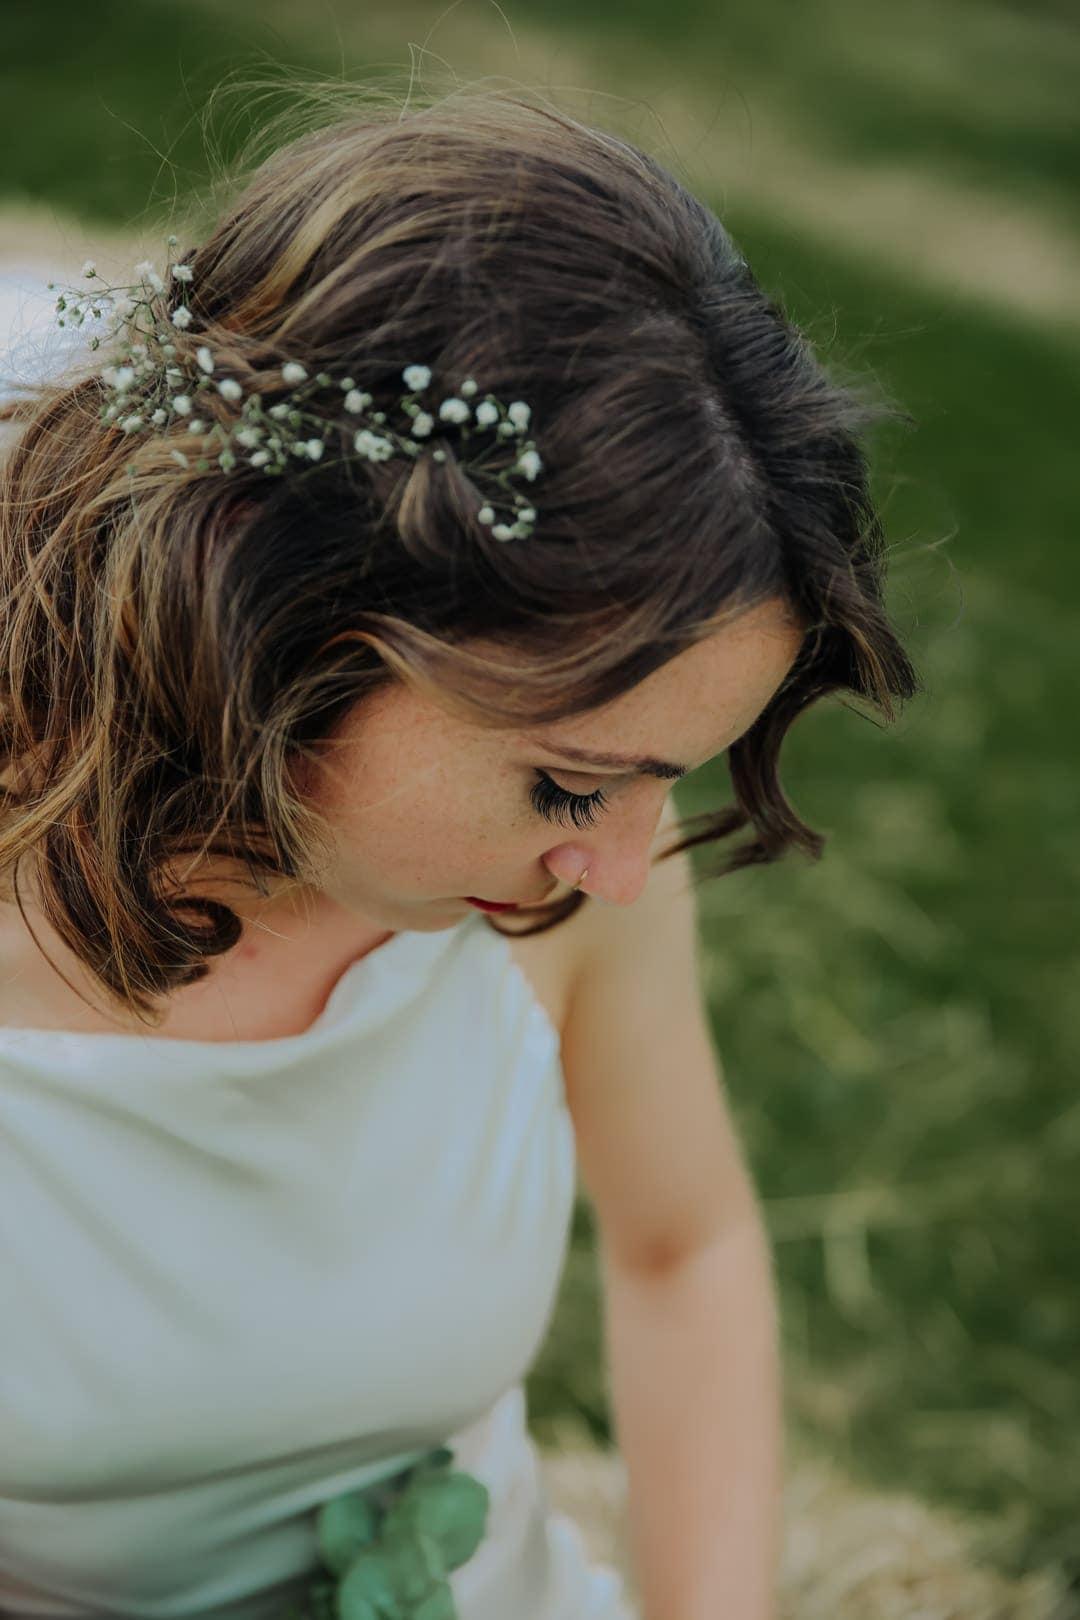 bridal-portrait-flower-crown-satin-wedding-dress